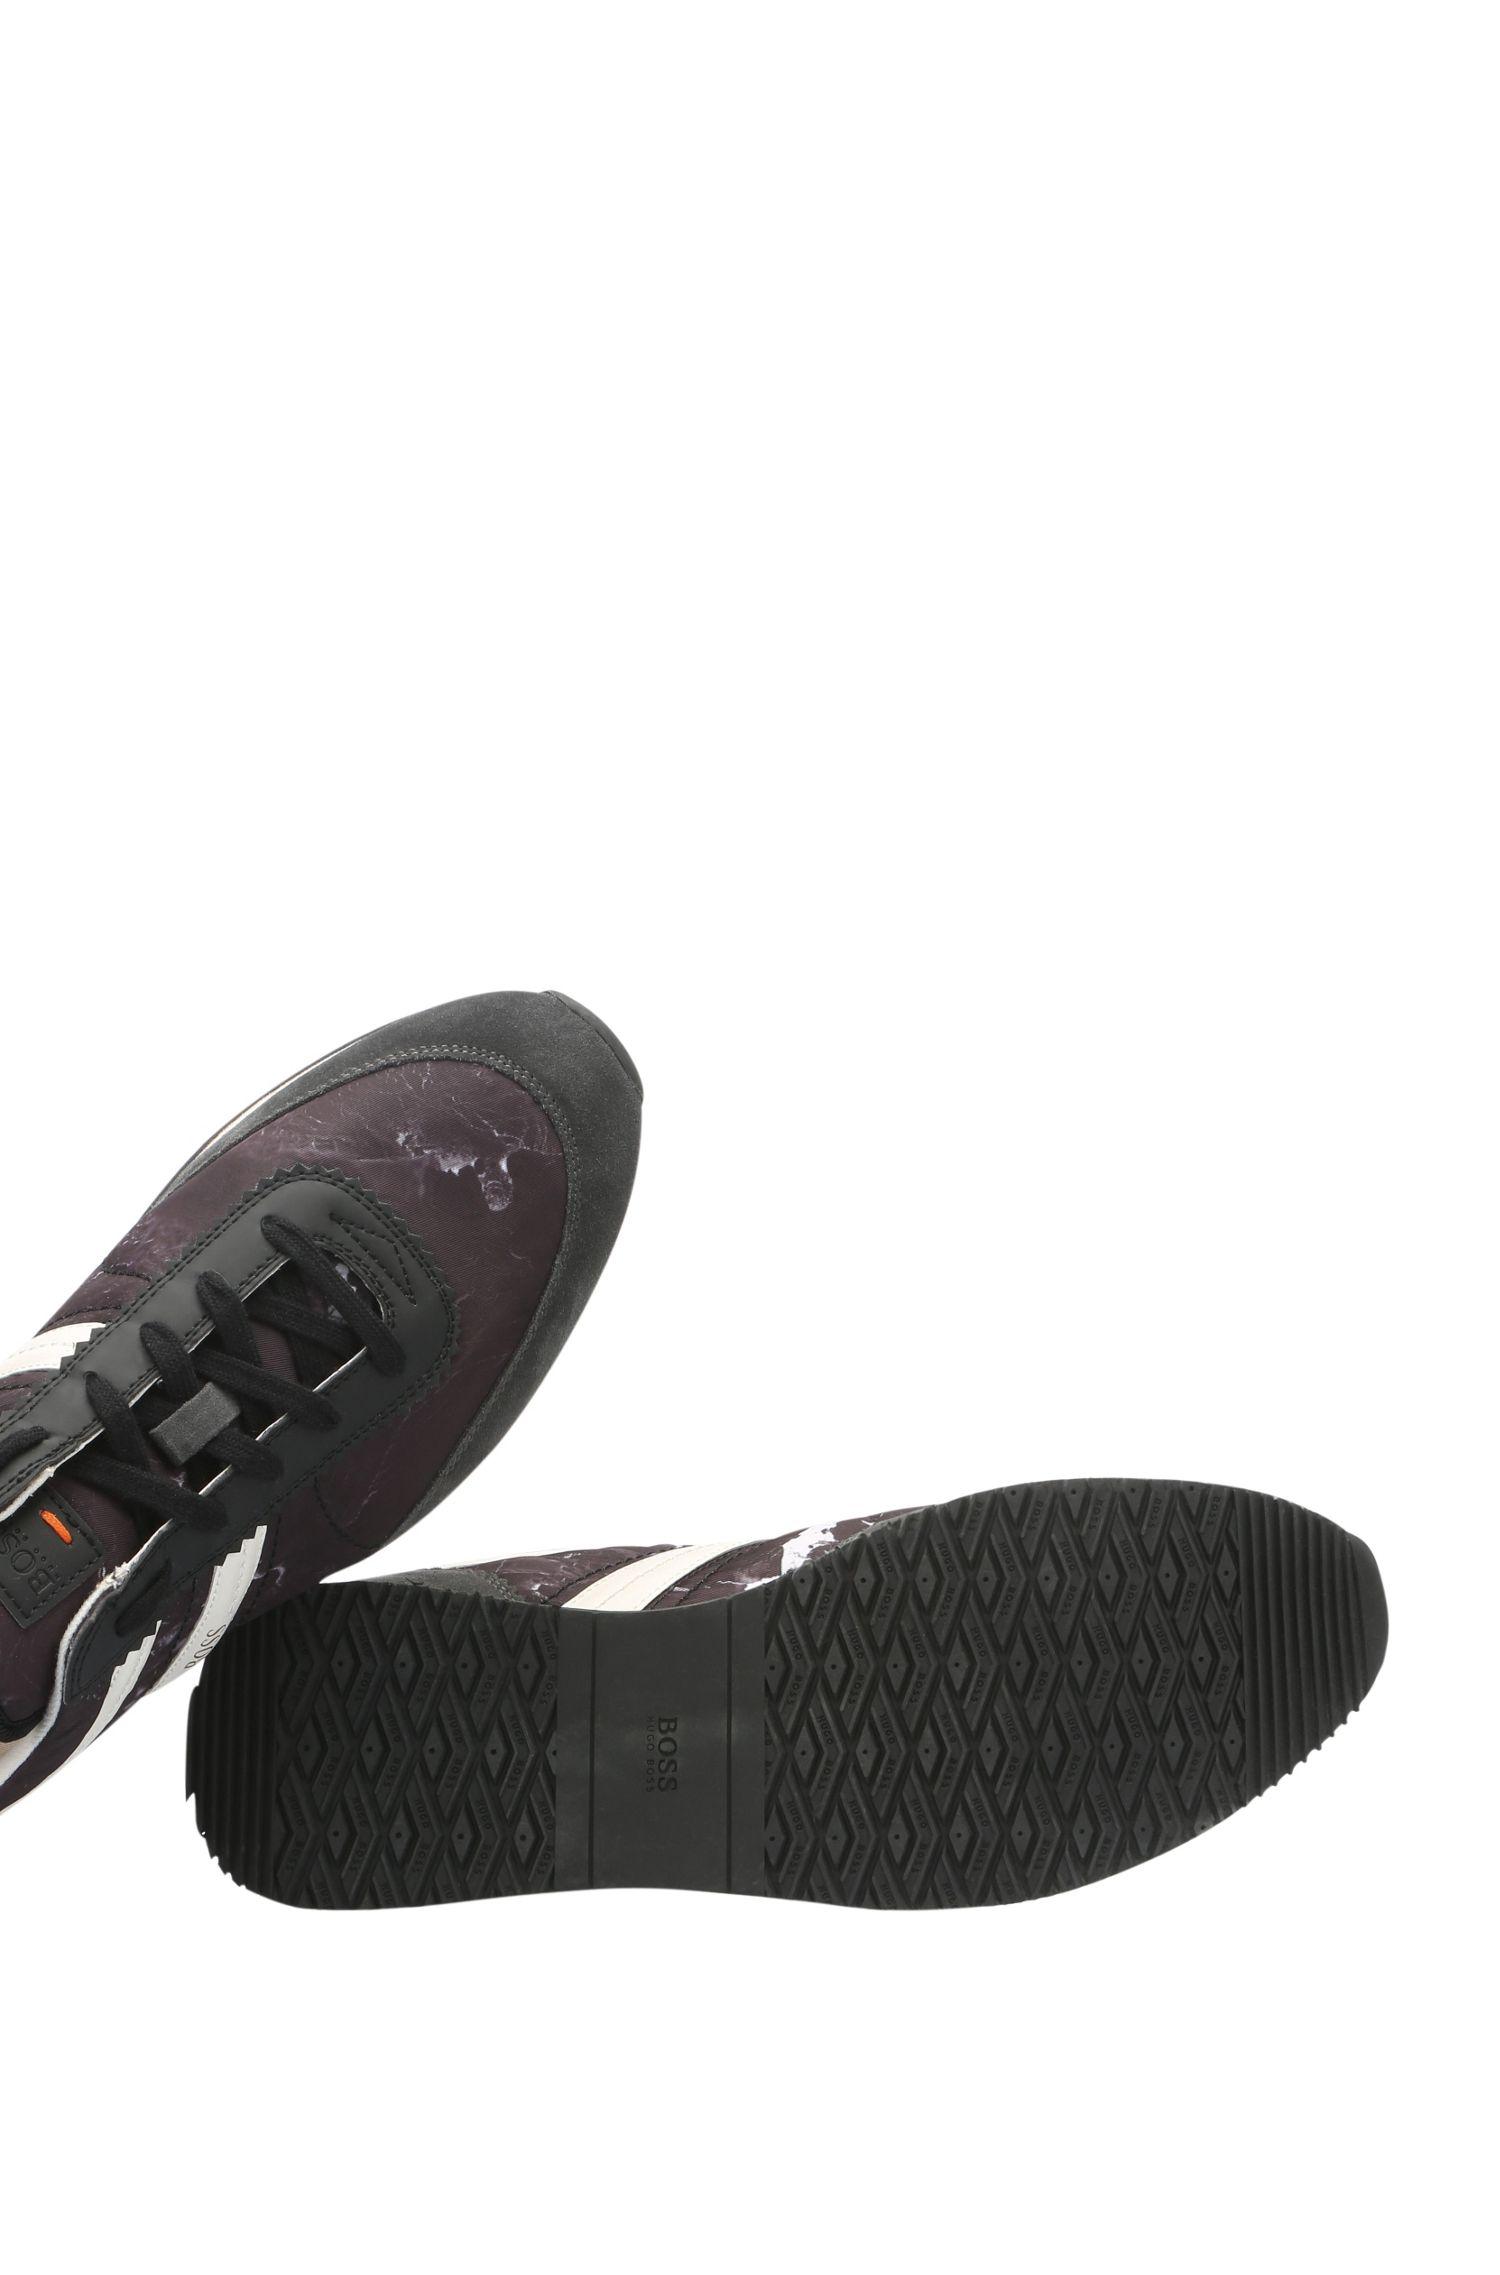 Sneakers mit Textil, Velours und Partien in Leder-Optik: ´Adrenal_Runn_nypr`